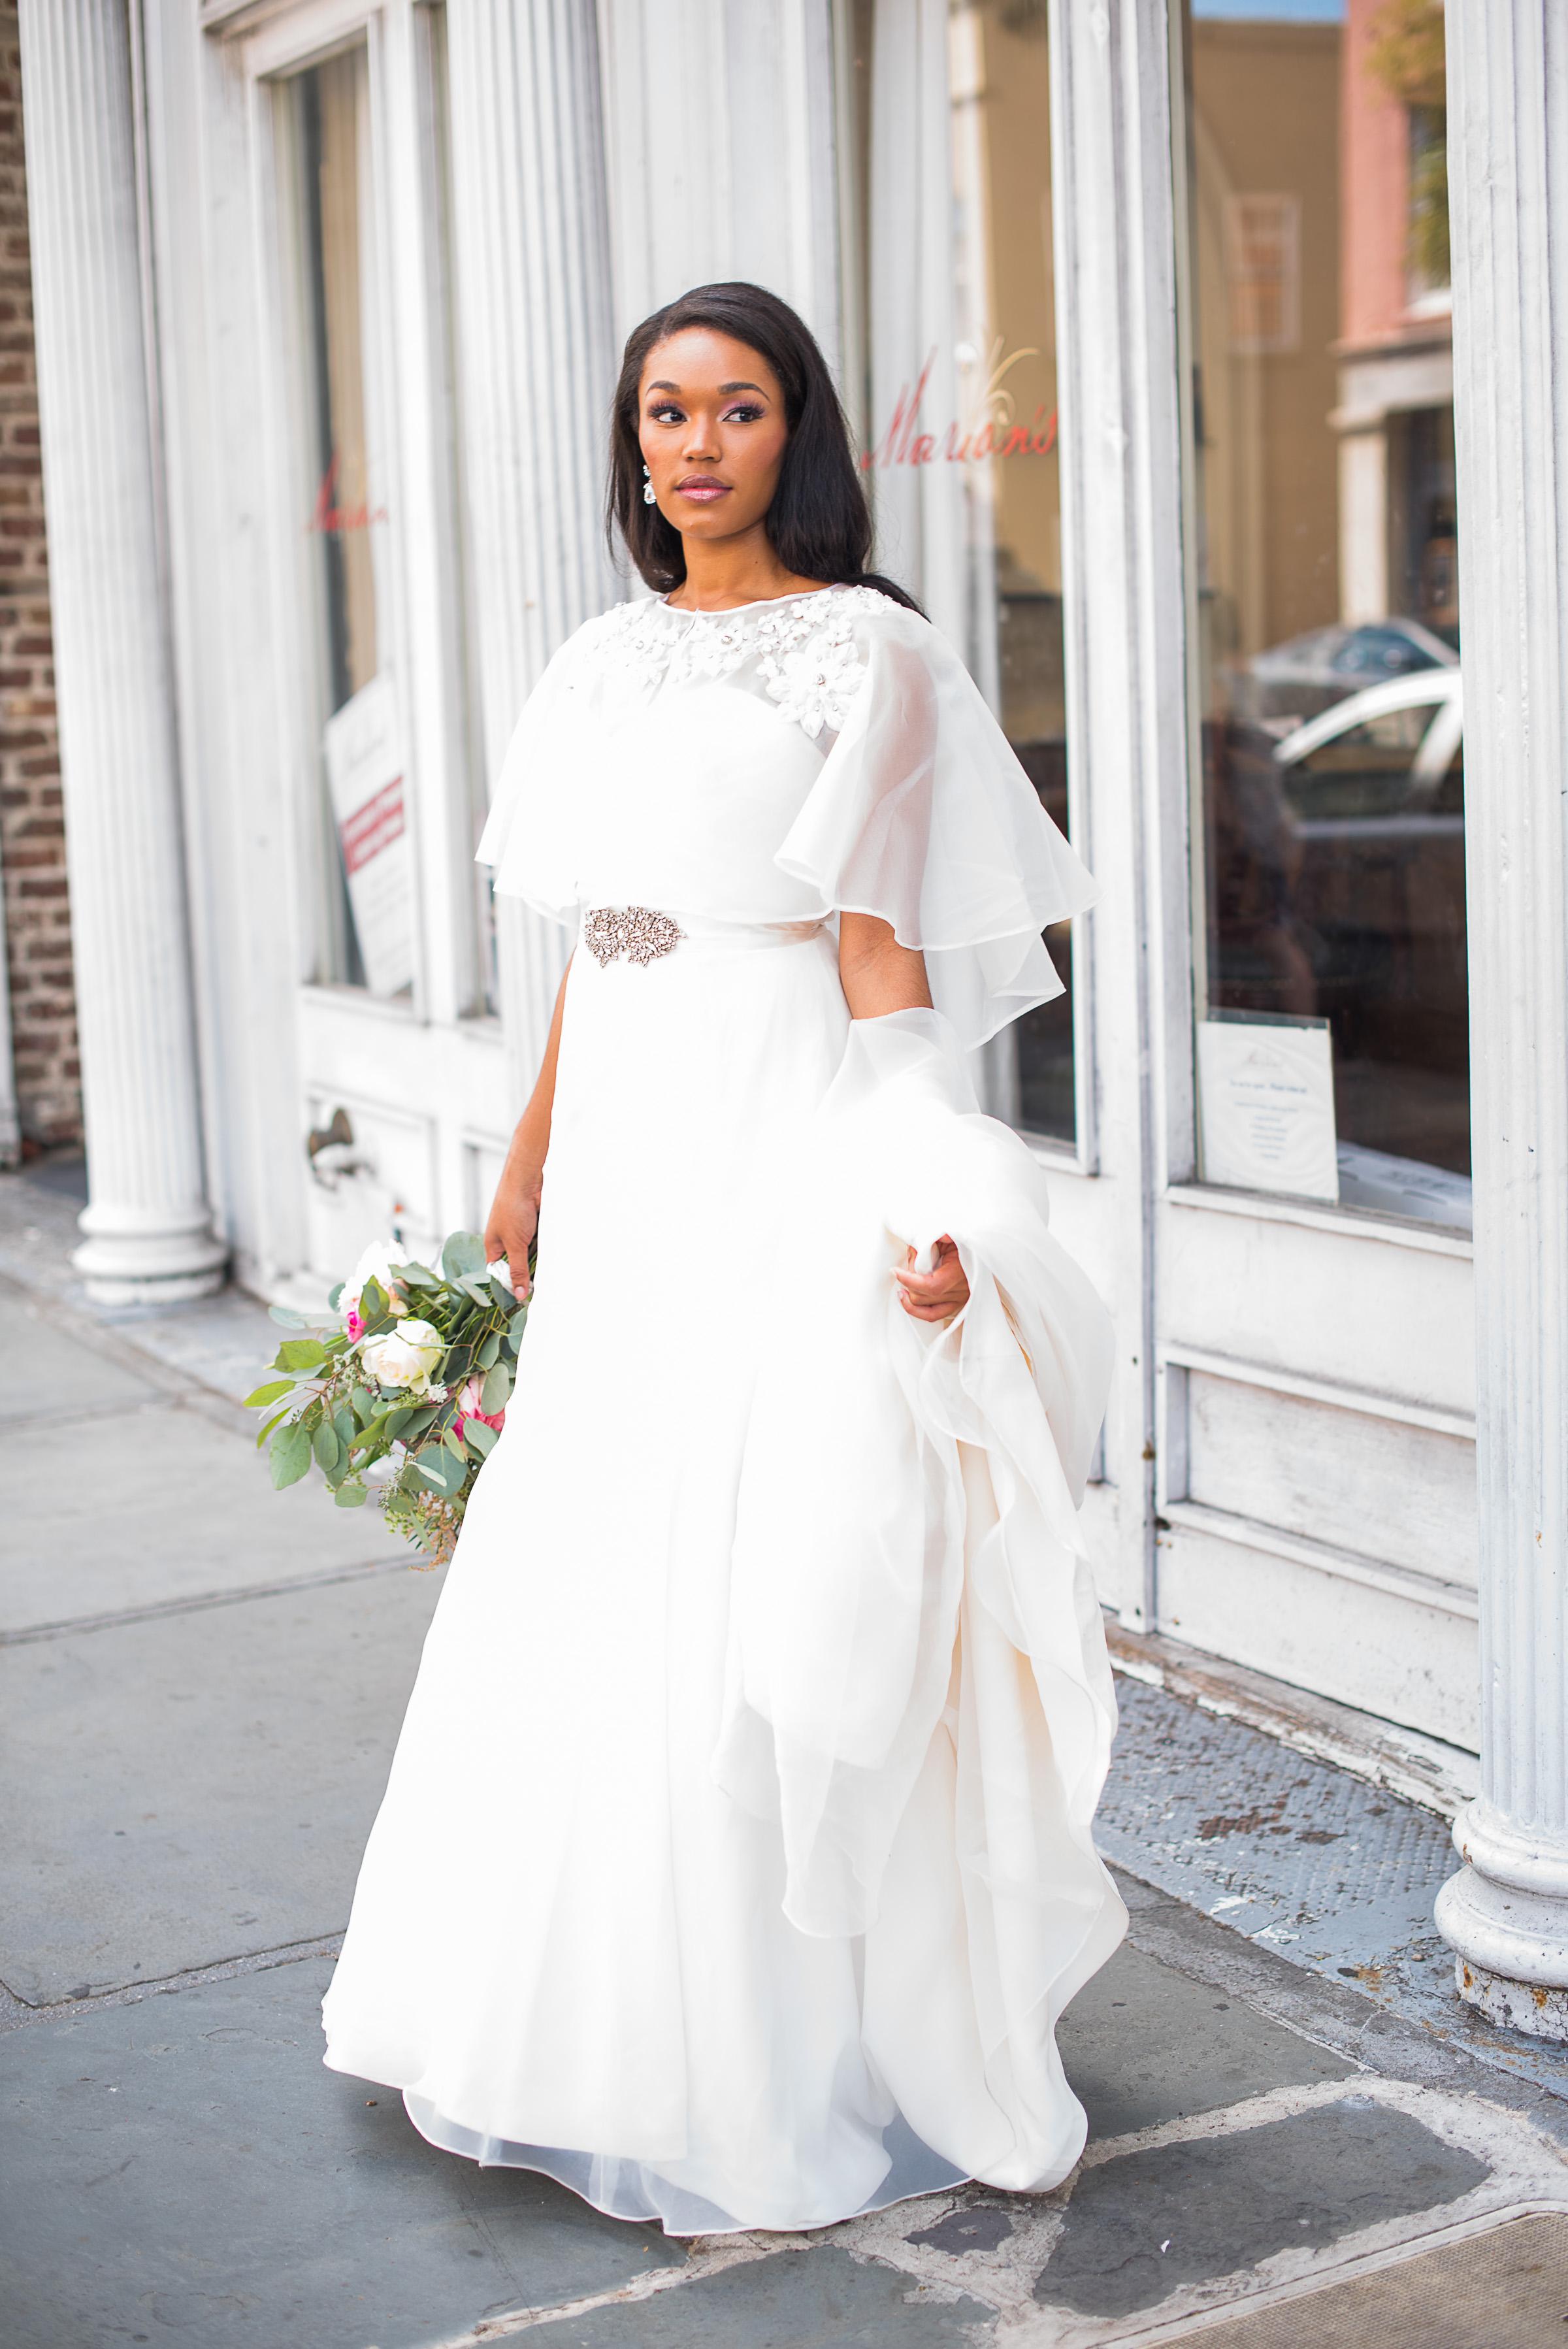 Charleston wedding dress from Ivory + Beau